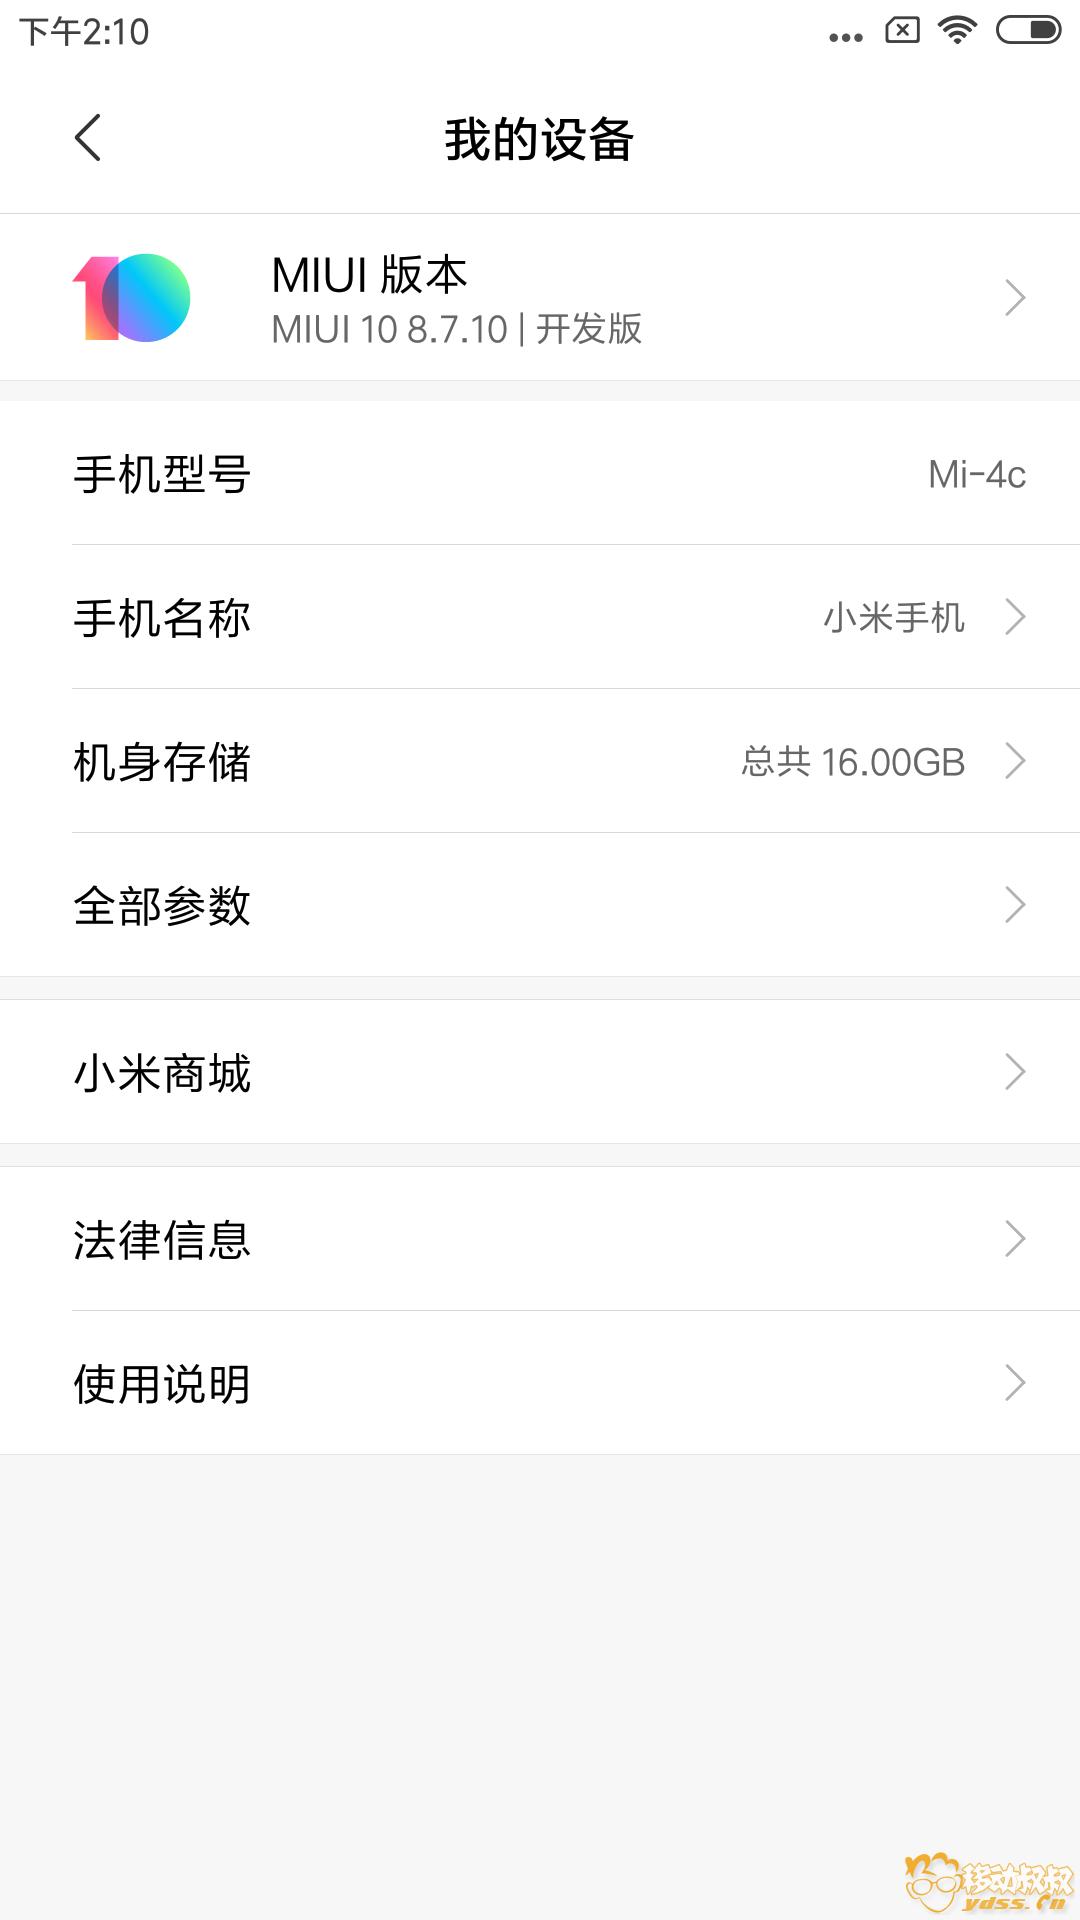 Screenshot_2018-07-10-14-10-27-247_com.android.settings.png